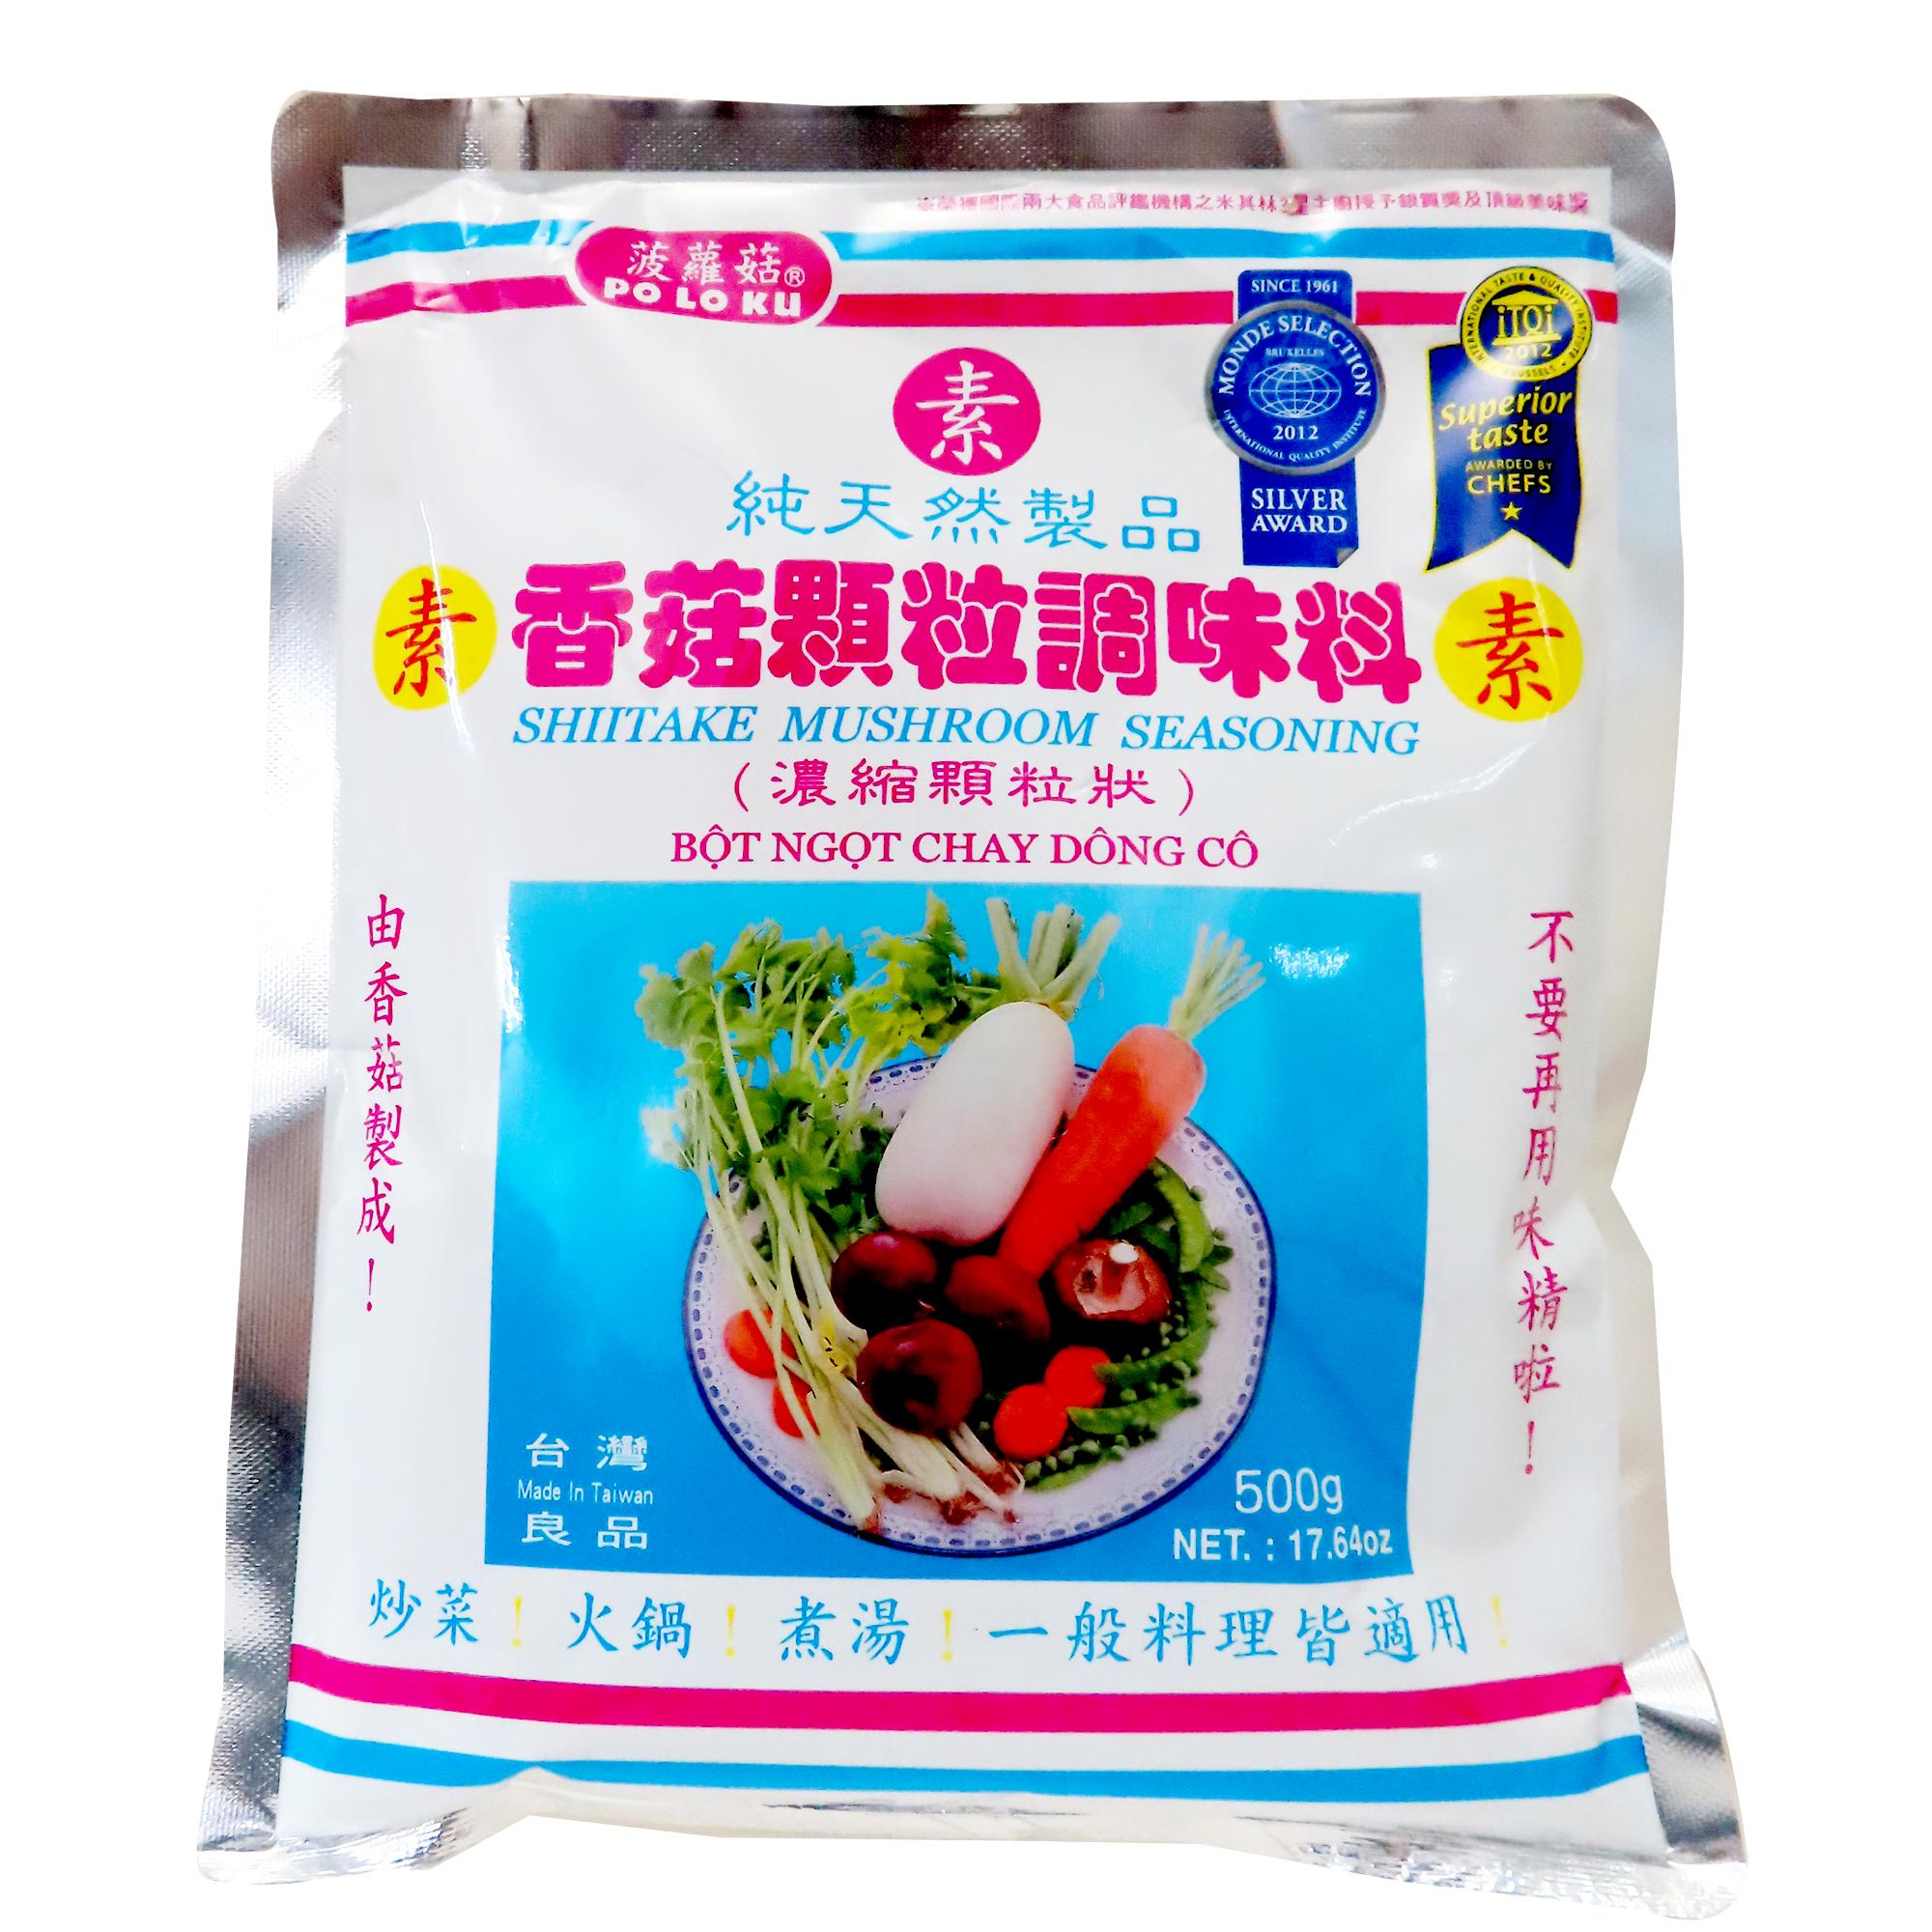 Image Poloku Mushroom Seasoning 菠萝菇-香菇颗粒调味料 (500gx12pkts)